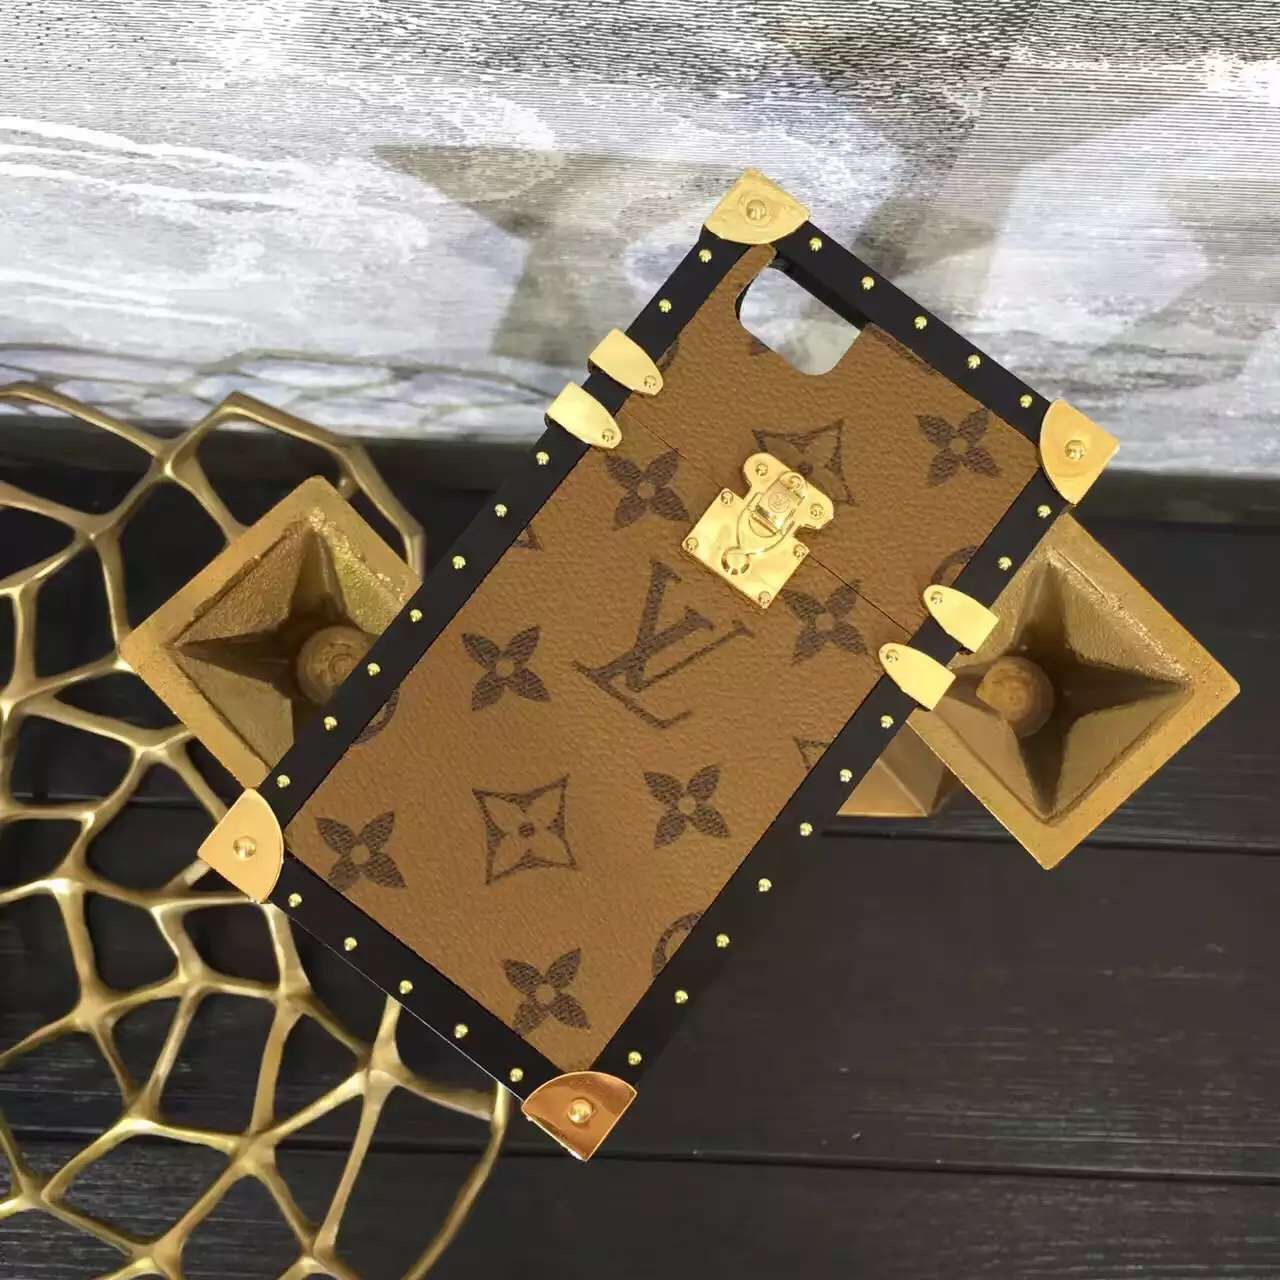 2017 Louis Vuitton Petite Malle iPhone 7/6 Case Yellow